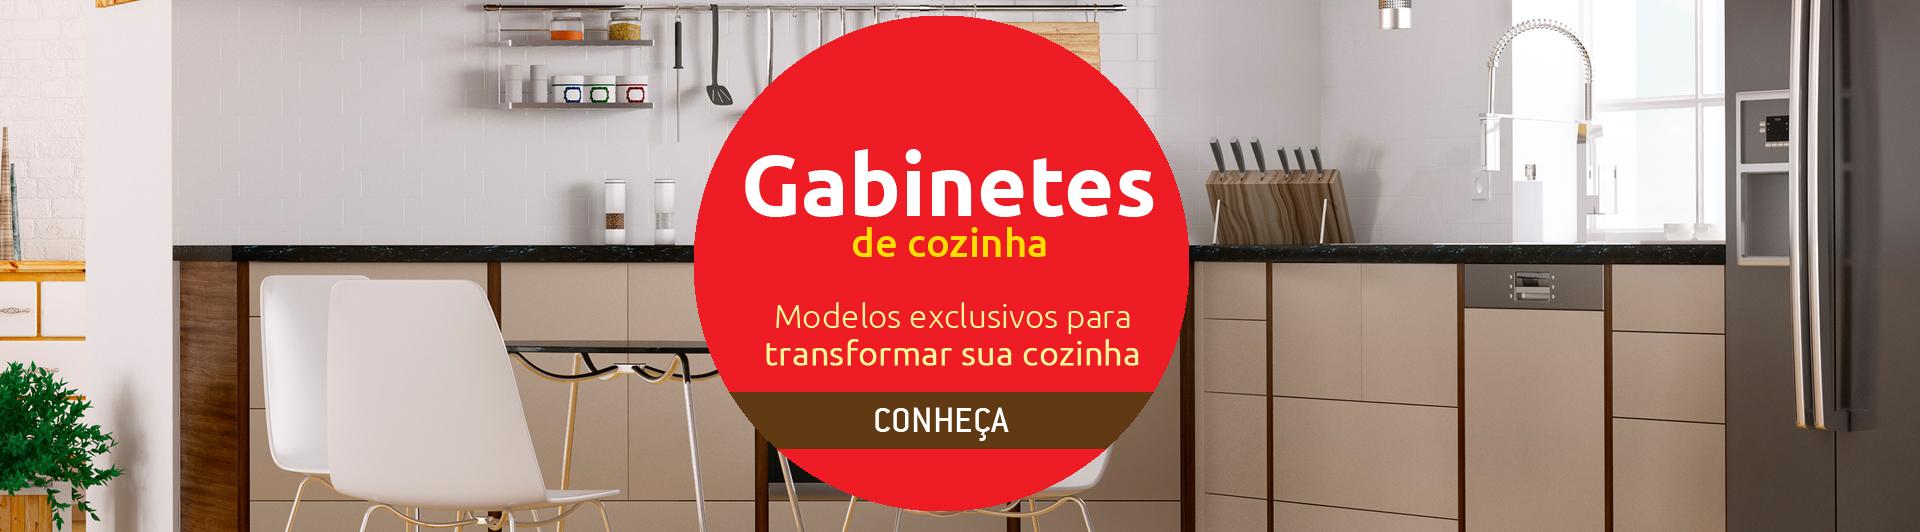 Banner - Gabinetes Cozinha